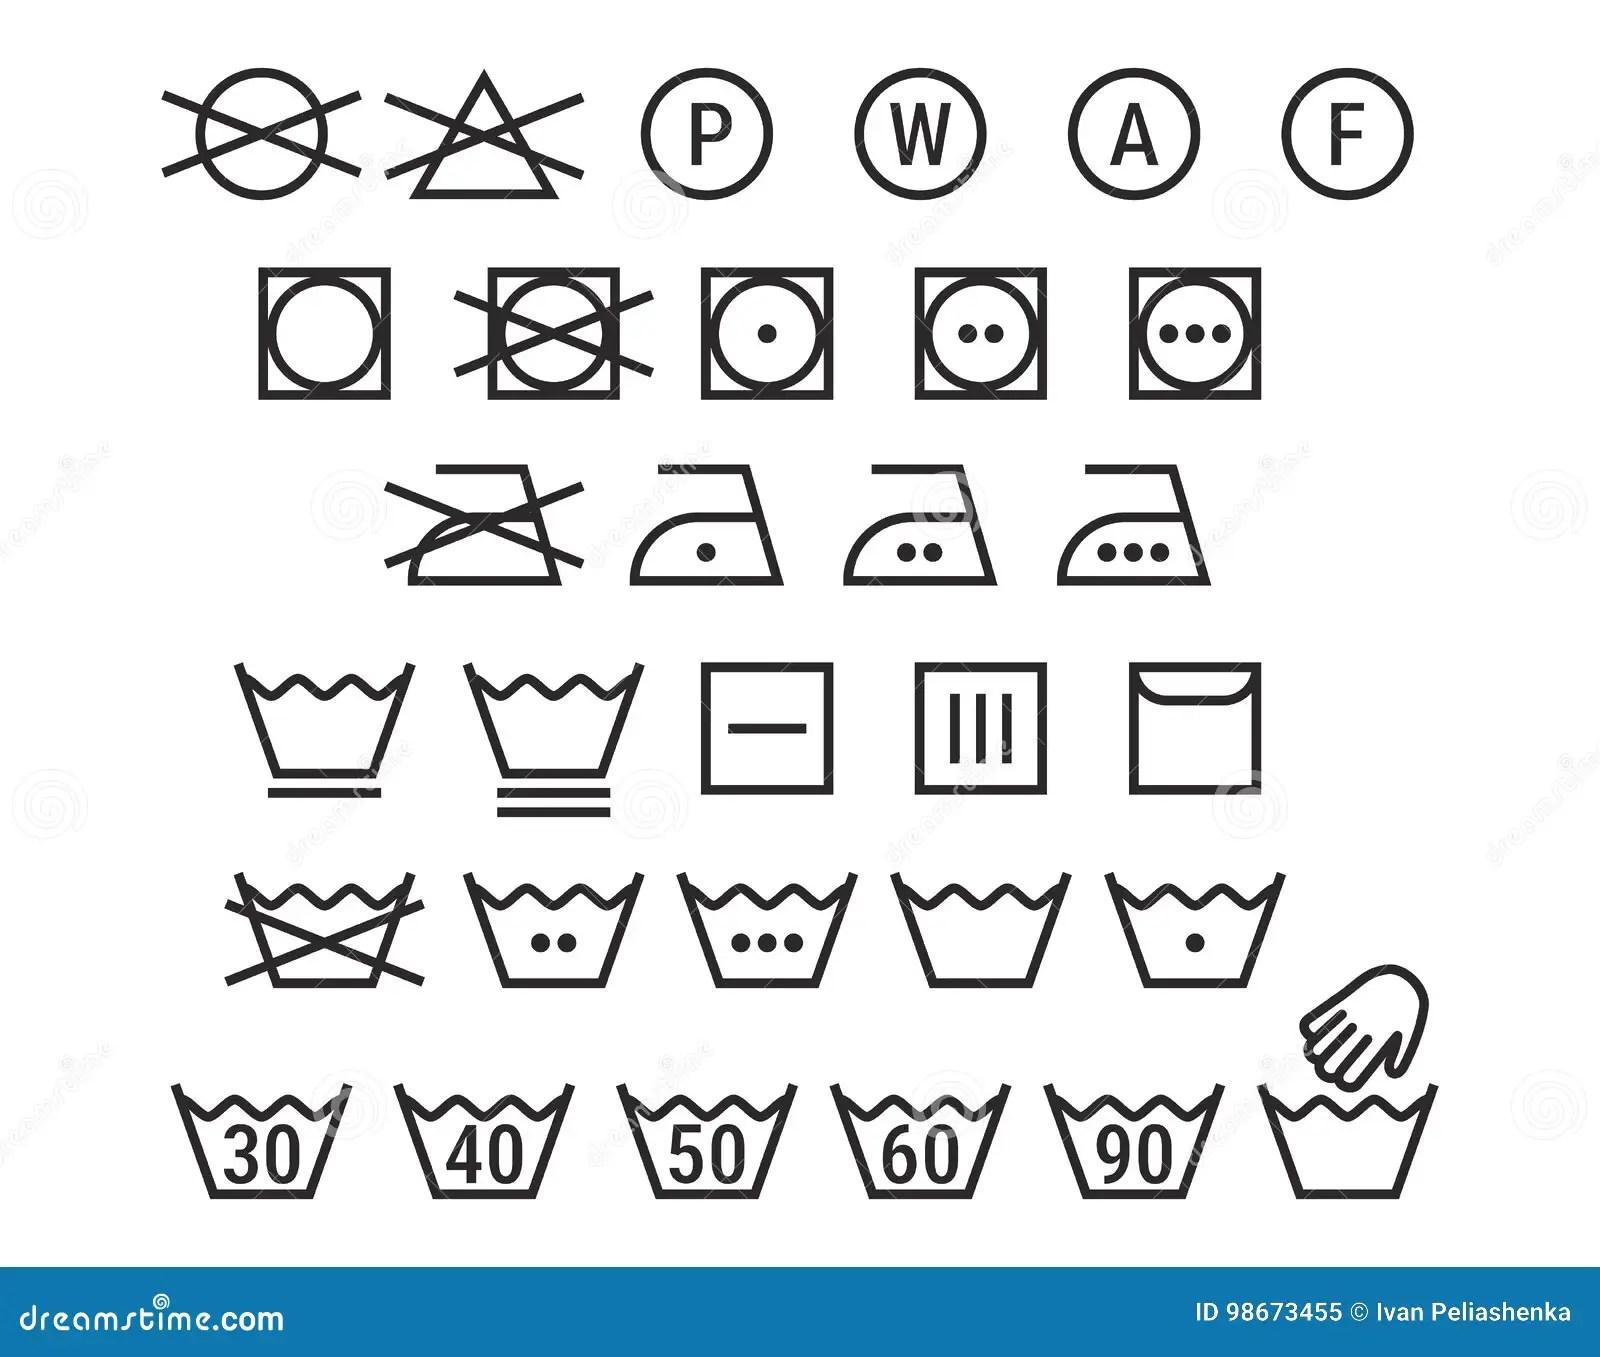 Washing Symbols Cartoon Vector